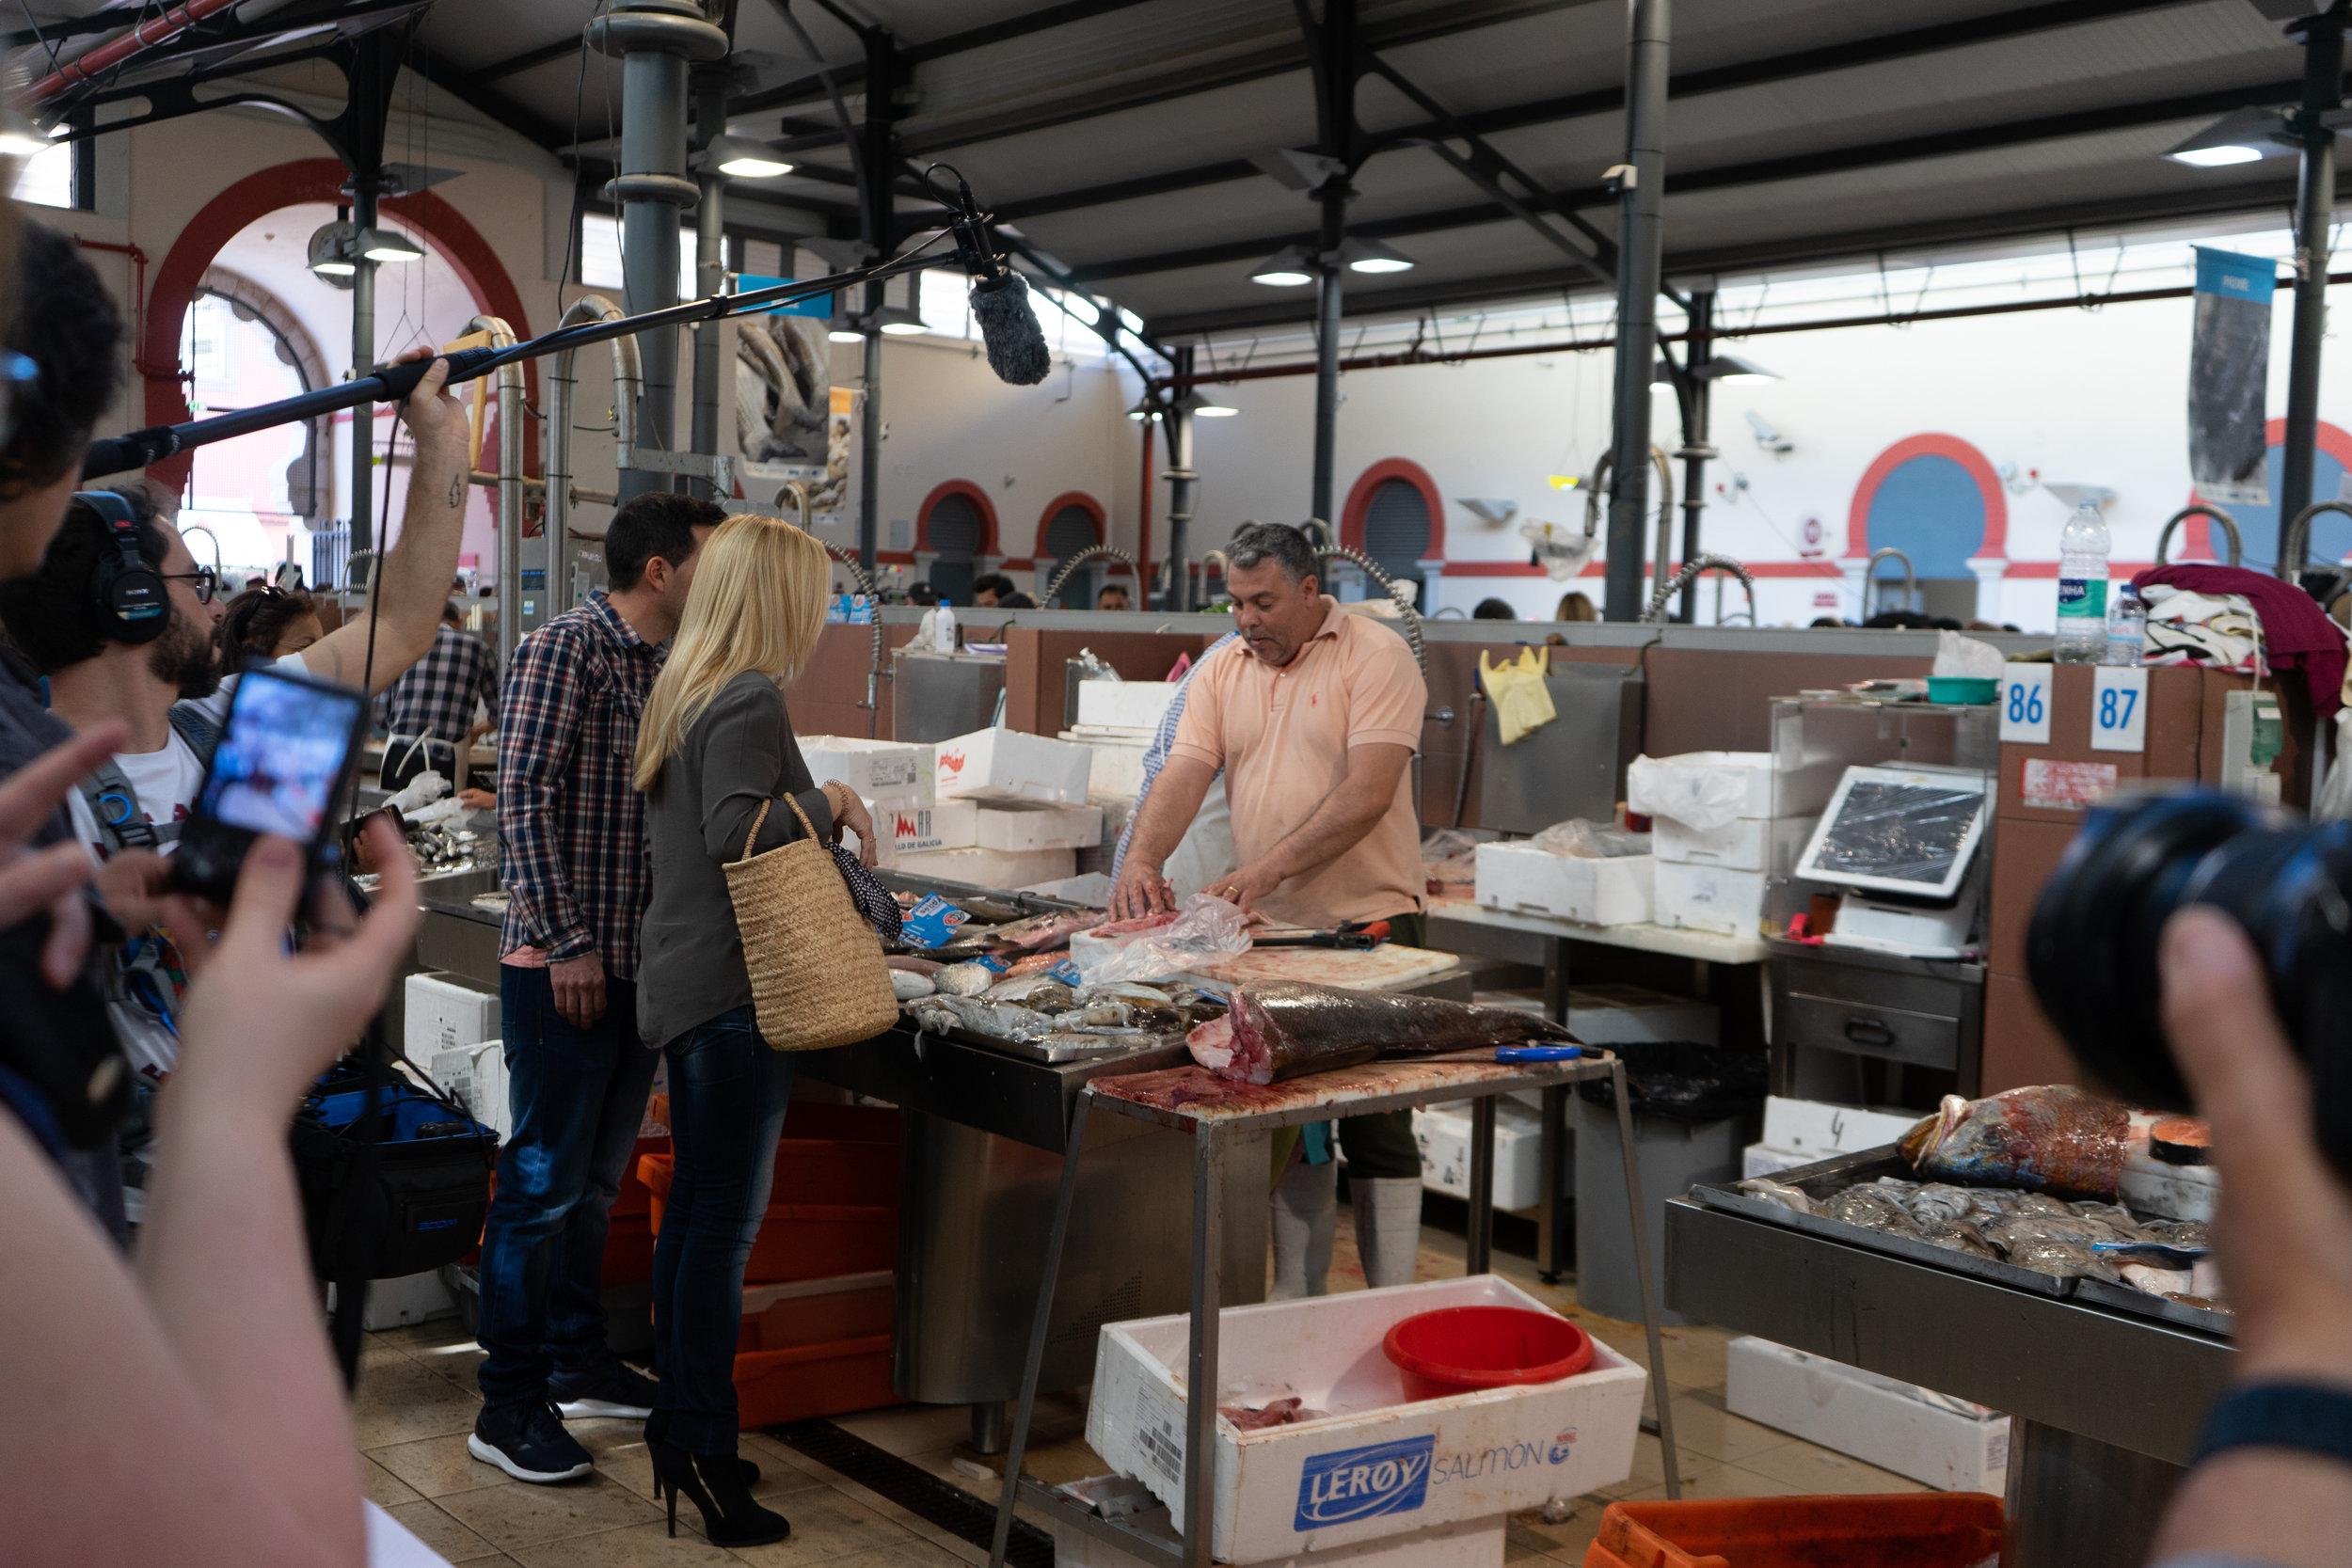 Mercado de Loulé - making of